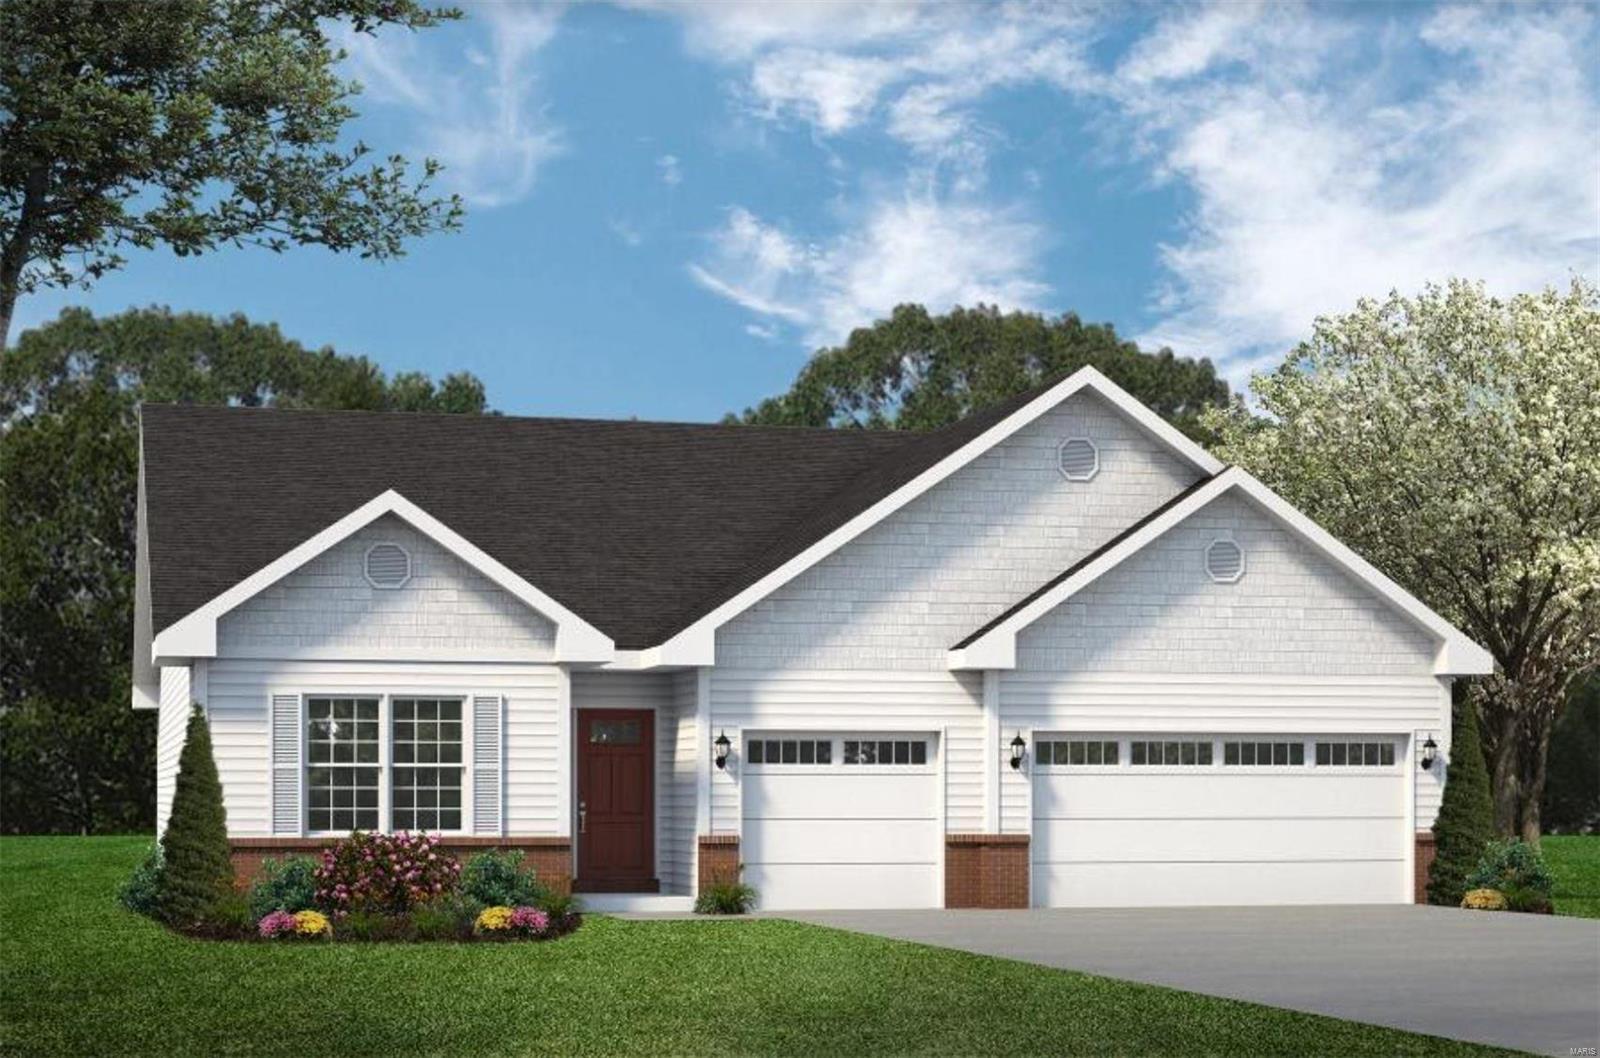 117 Garrettford Property Photo - Bethalto, IL real estate listing